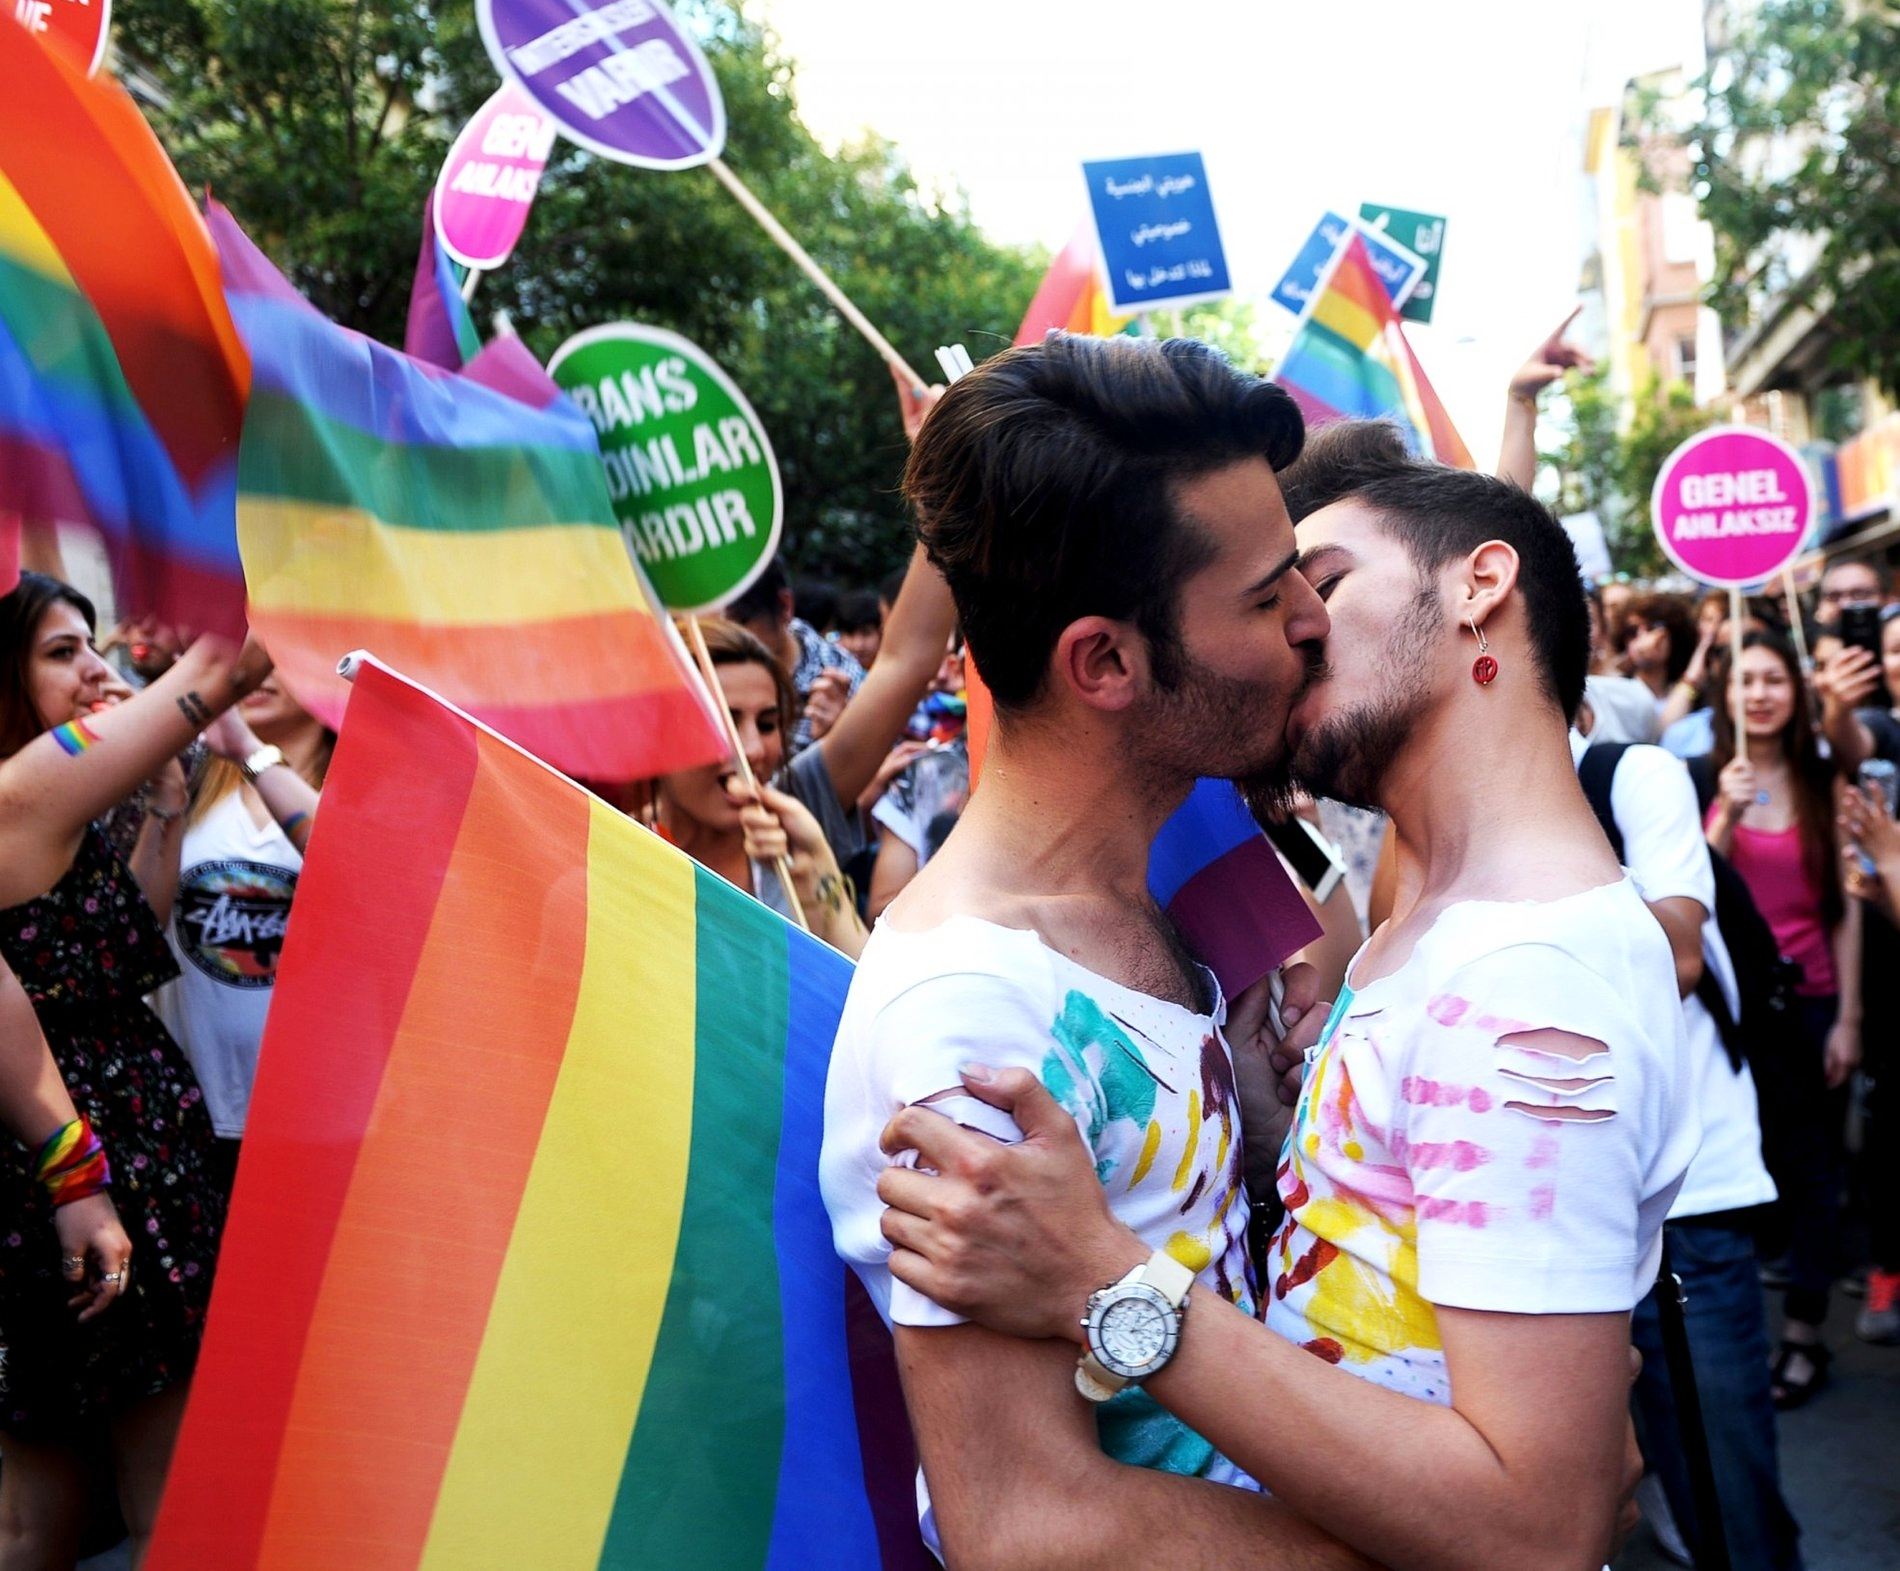 GTY_gay_pride_istanbul_6_jt_150628.jpg